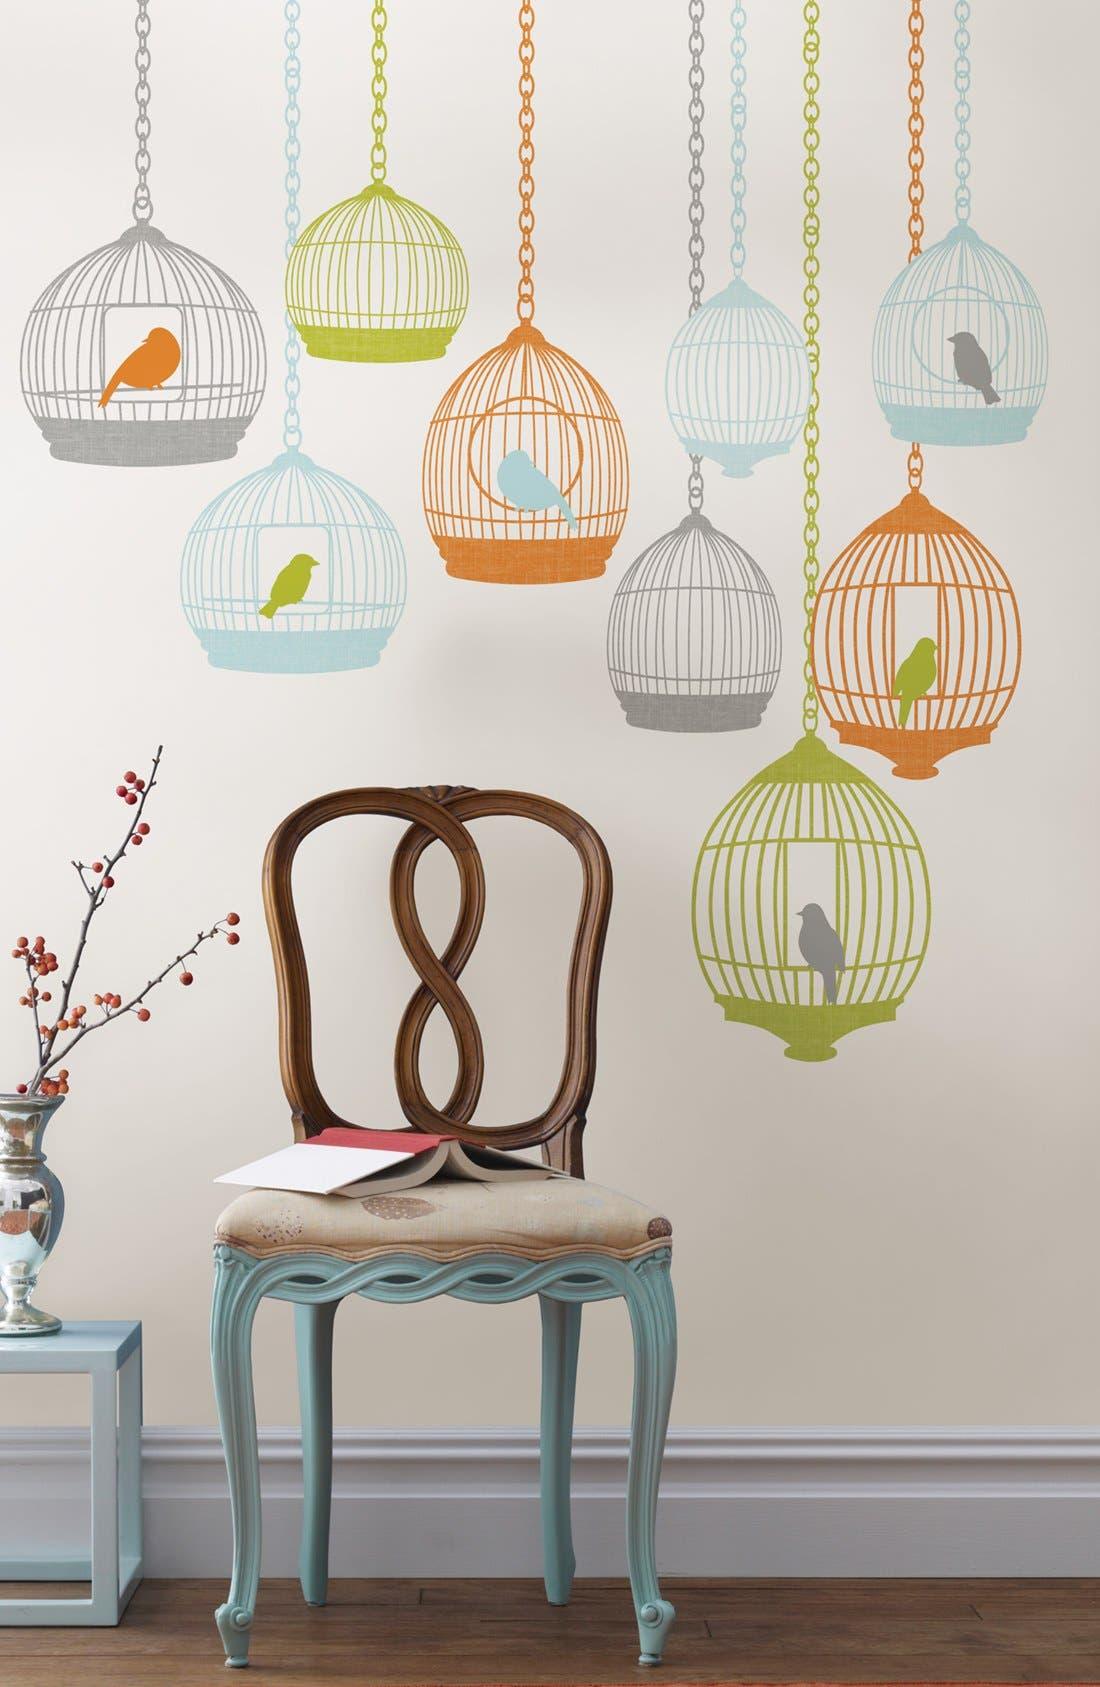 Alternate Image 1 Selected - Wallpops Birdcage Wall Art